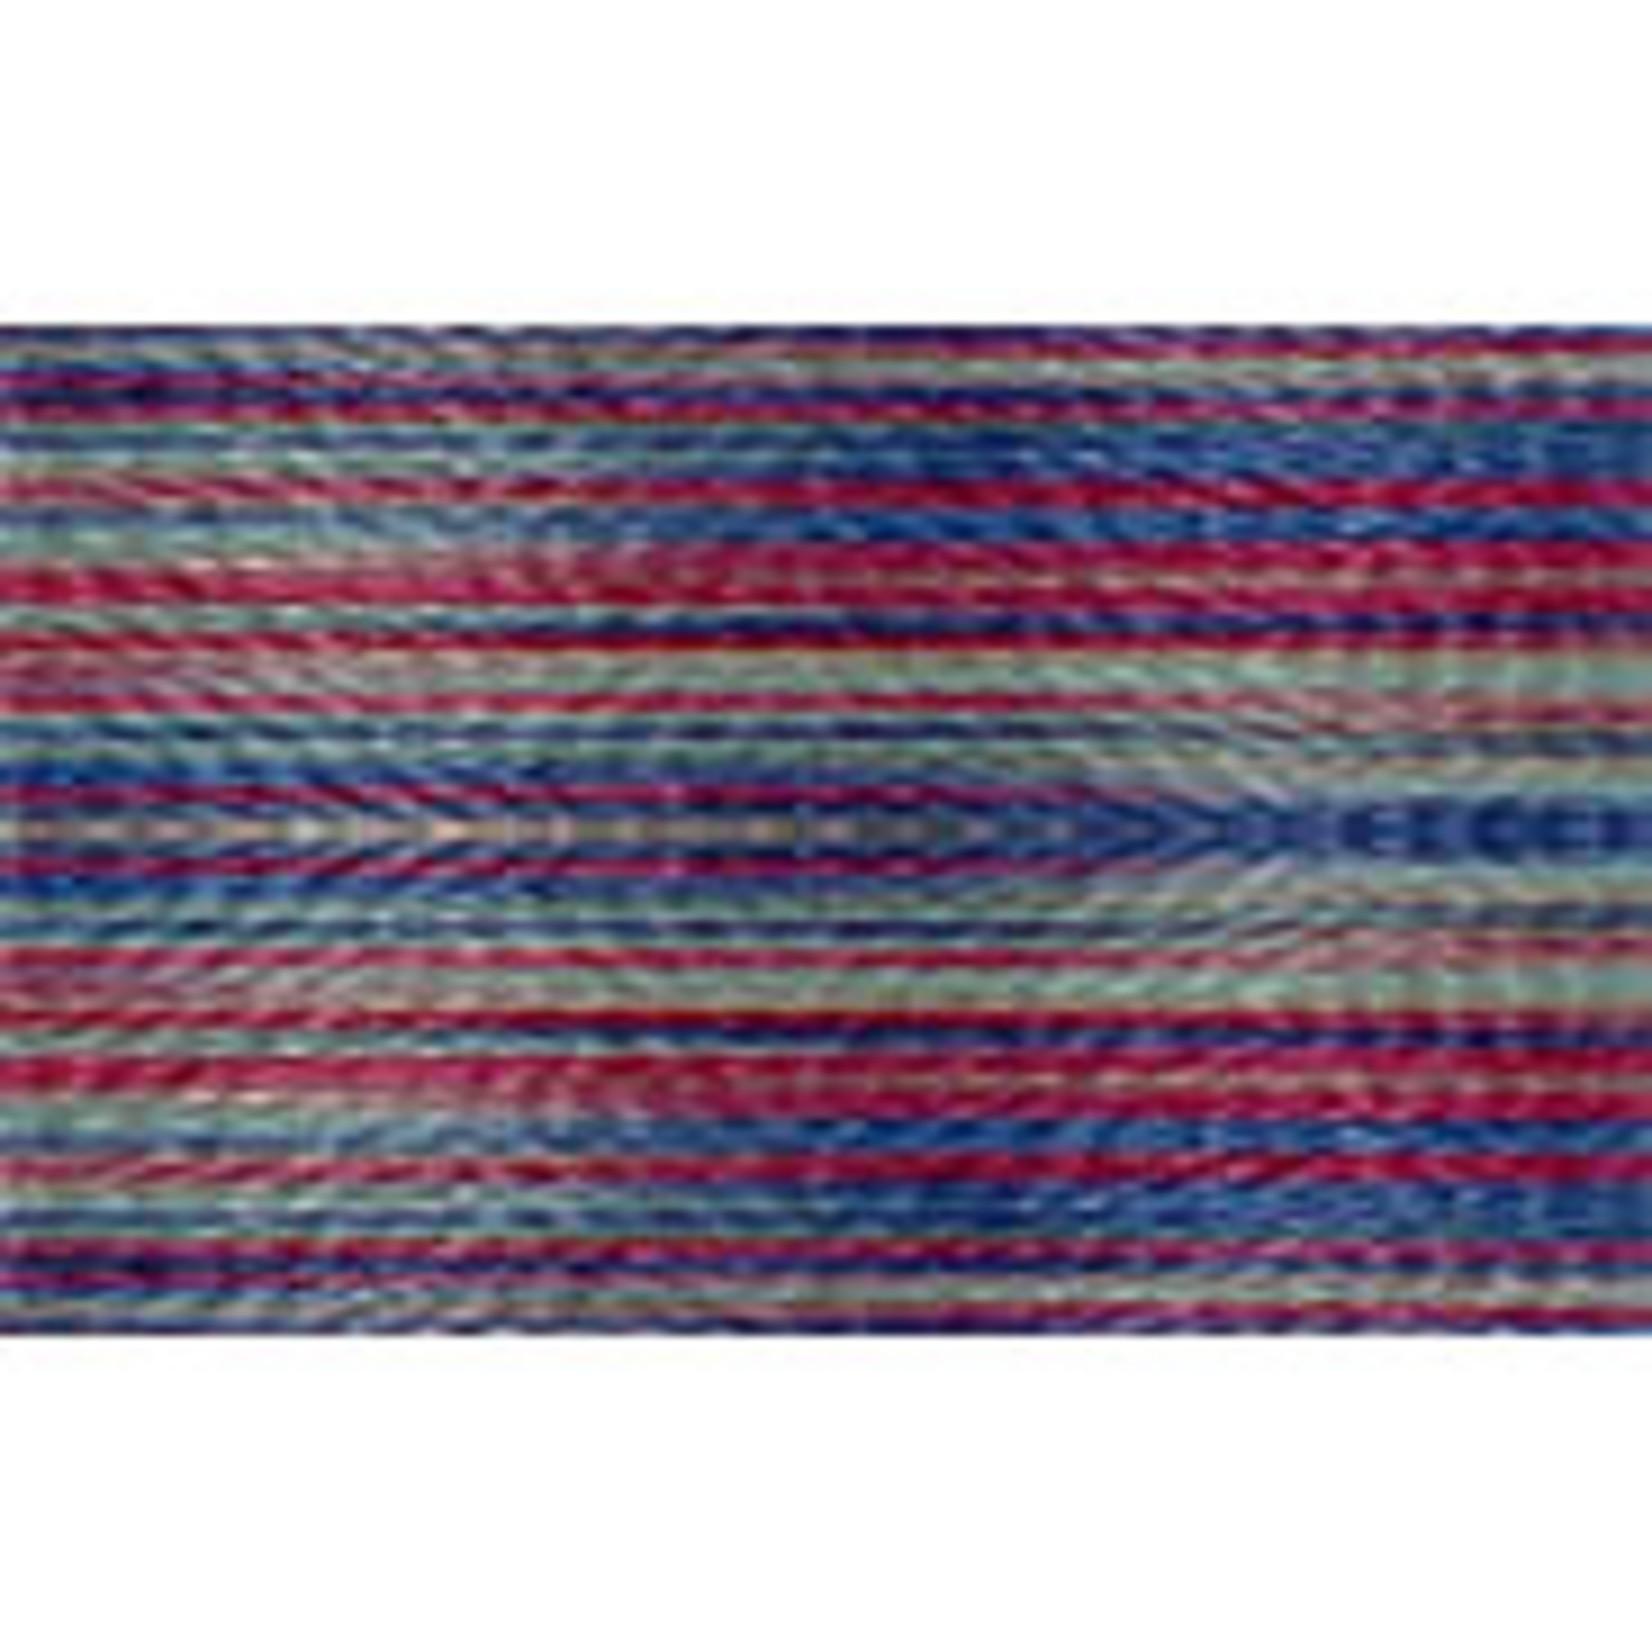 Amann Mettler Isacord Multi - #40 - 1000 m - 9970